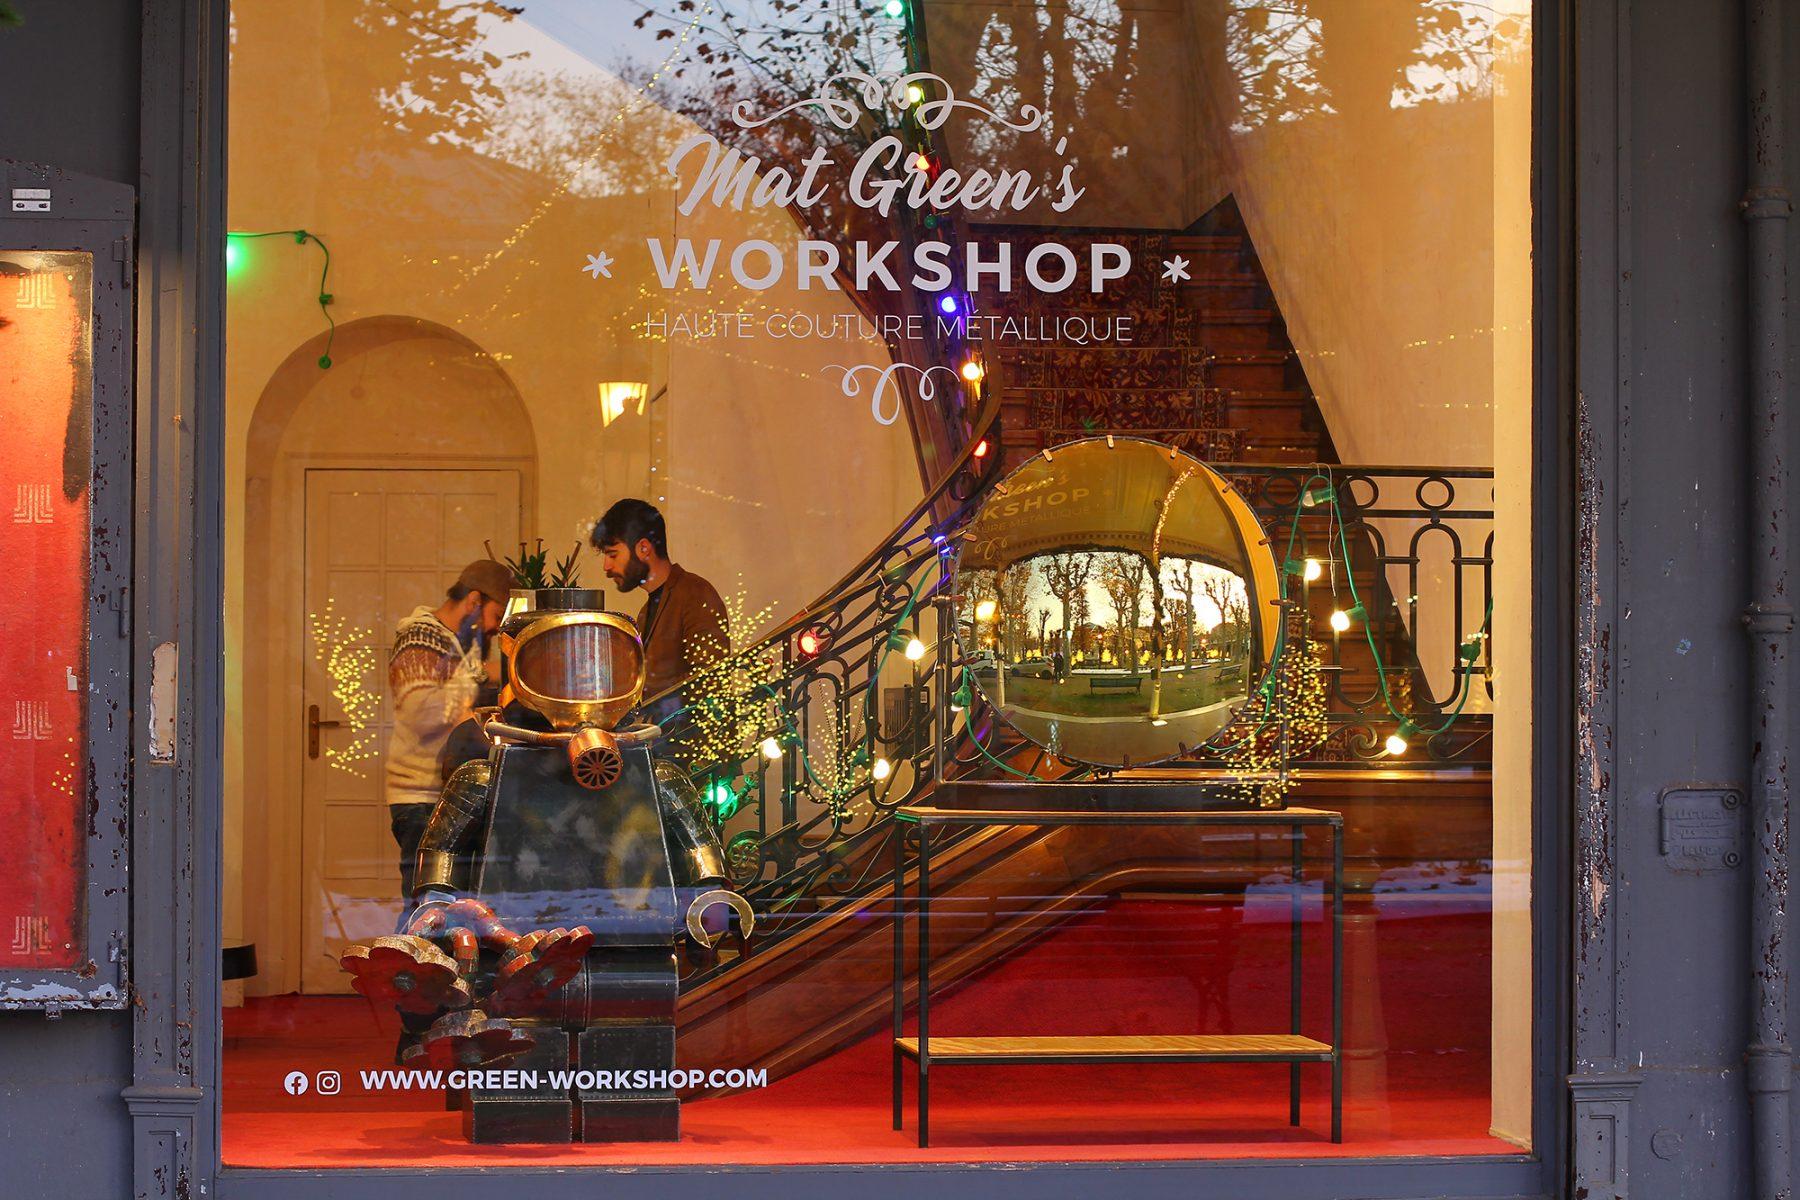 Mat Green's Workshop à Vichy au Fer à Cheval - Showroom éphémère